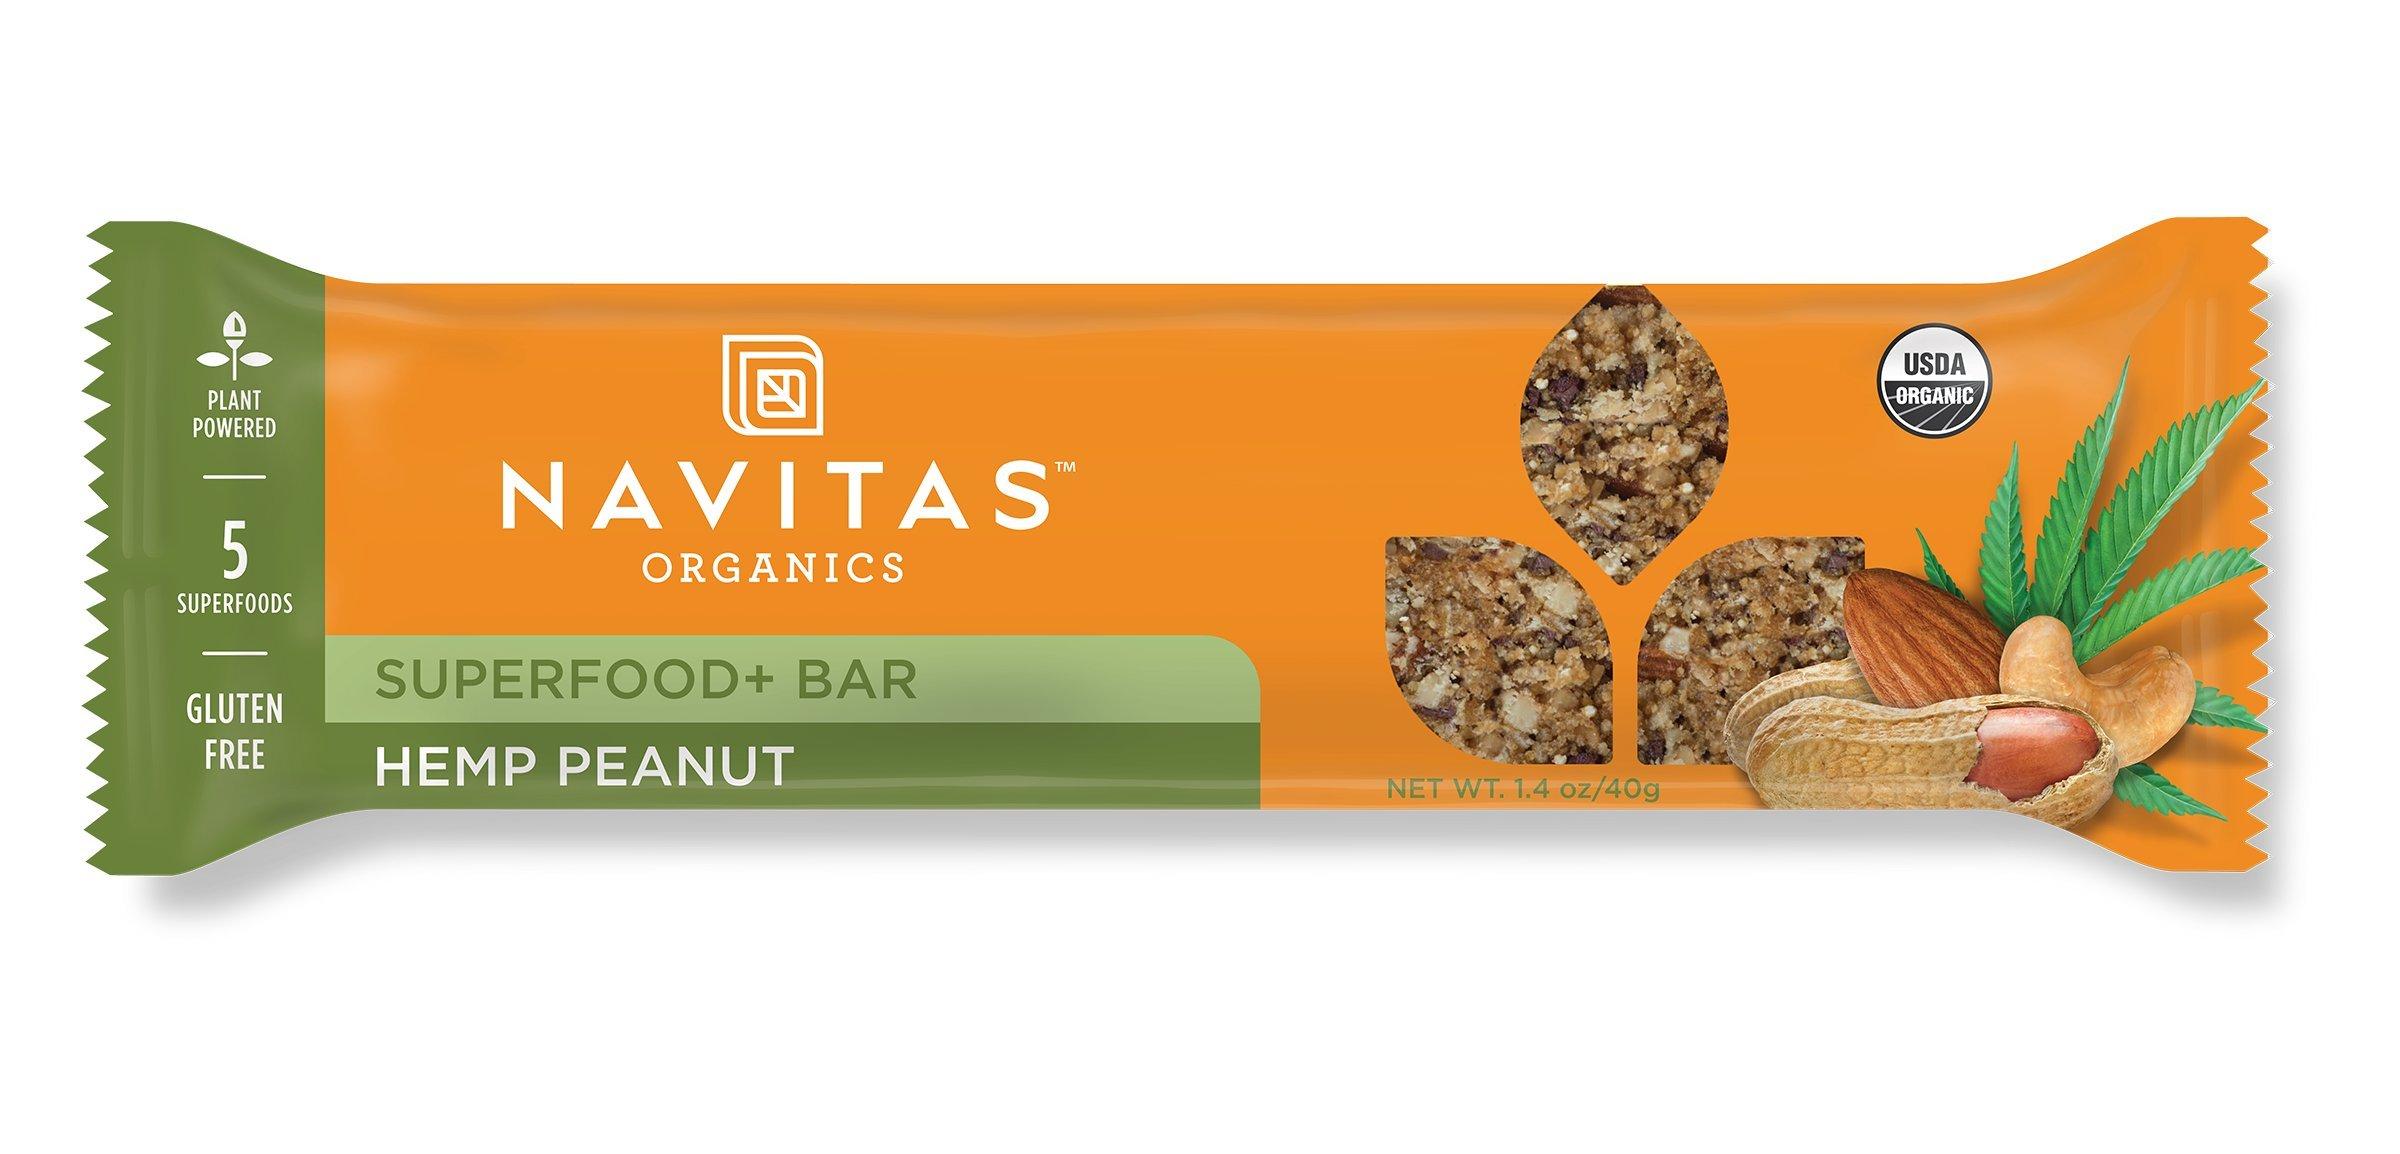 Navitas Organics, Gluten Free Superfood Snack Bar, Hemp Peanut, 12 Count